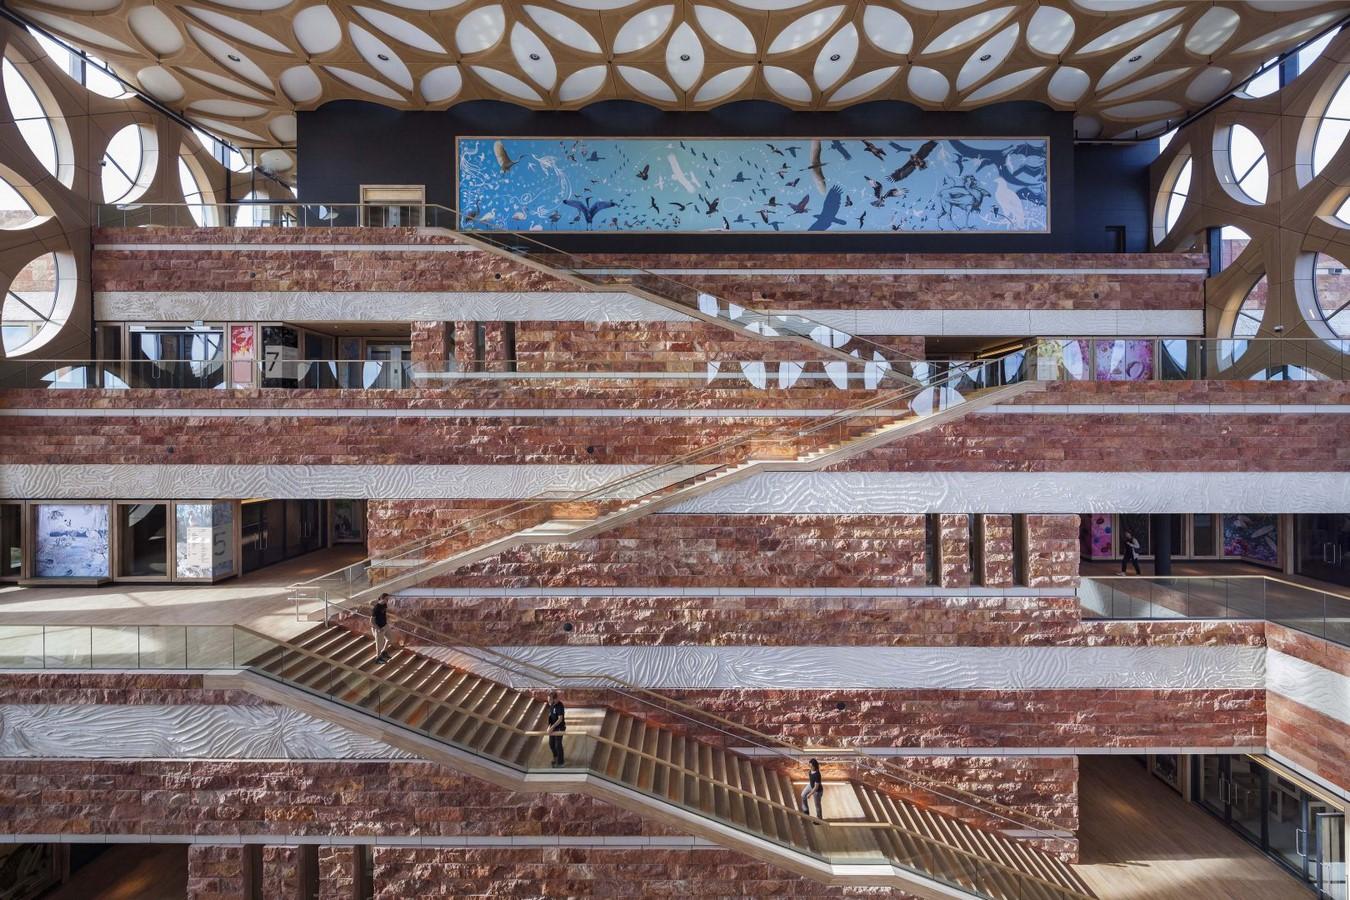 Naturalis Biodiversity Center in Leiden by Iris Van Herpen: The three-dimensional concrete structure - Sheet10